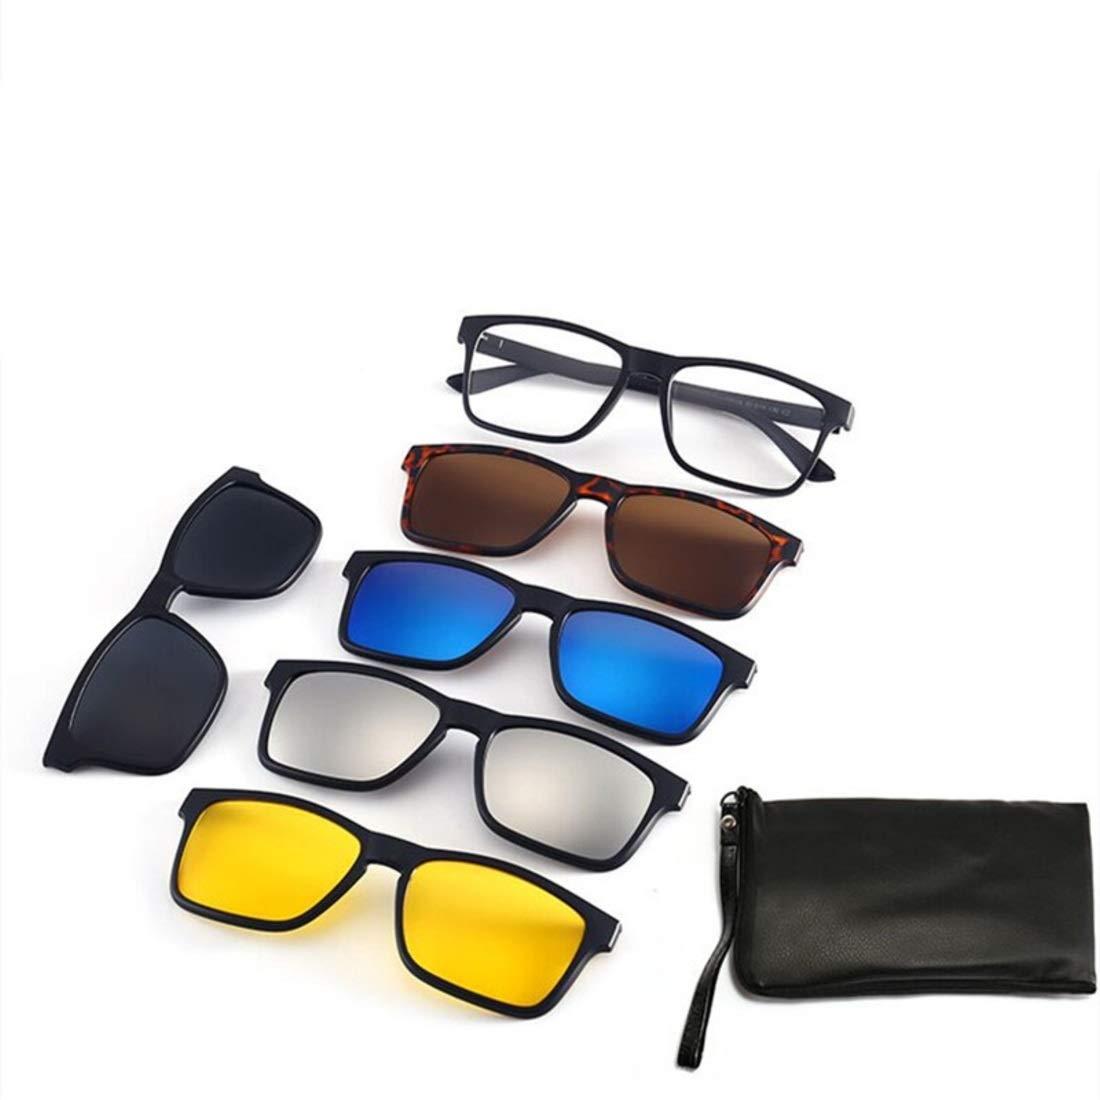 BAOYIT Men and Women Polarized Flat Glasses Five Glasses Set Night Vision Sunglasses Riding Glasses Set (Color : B) by BAOYIT